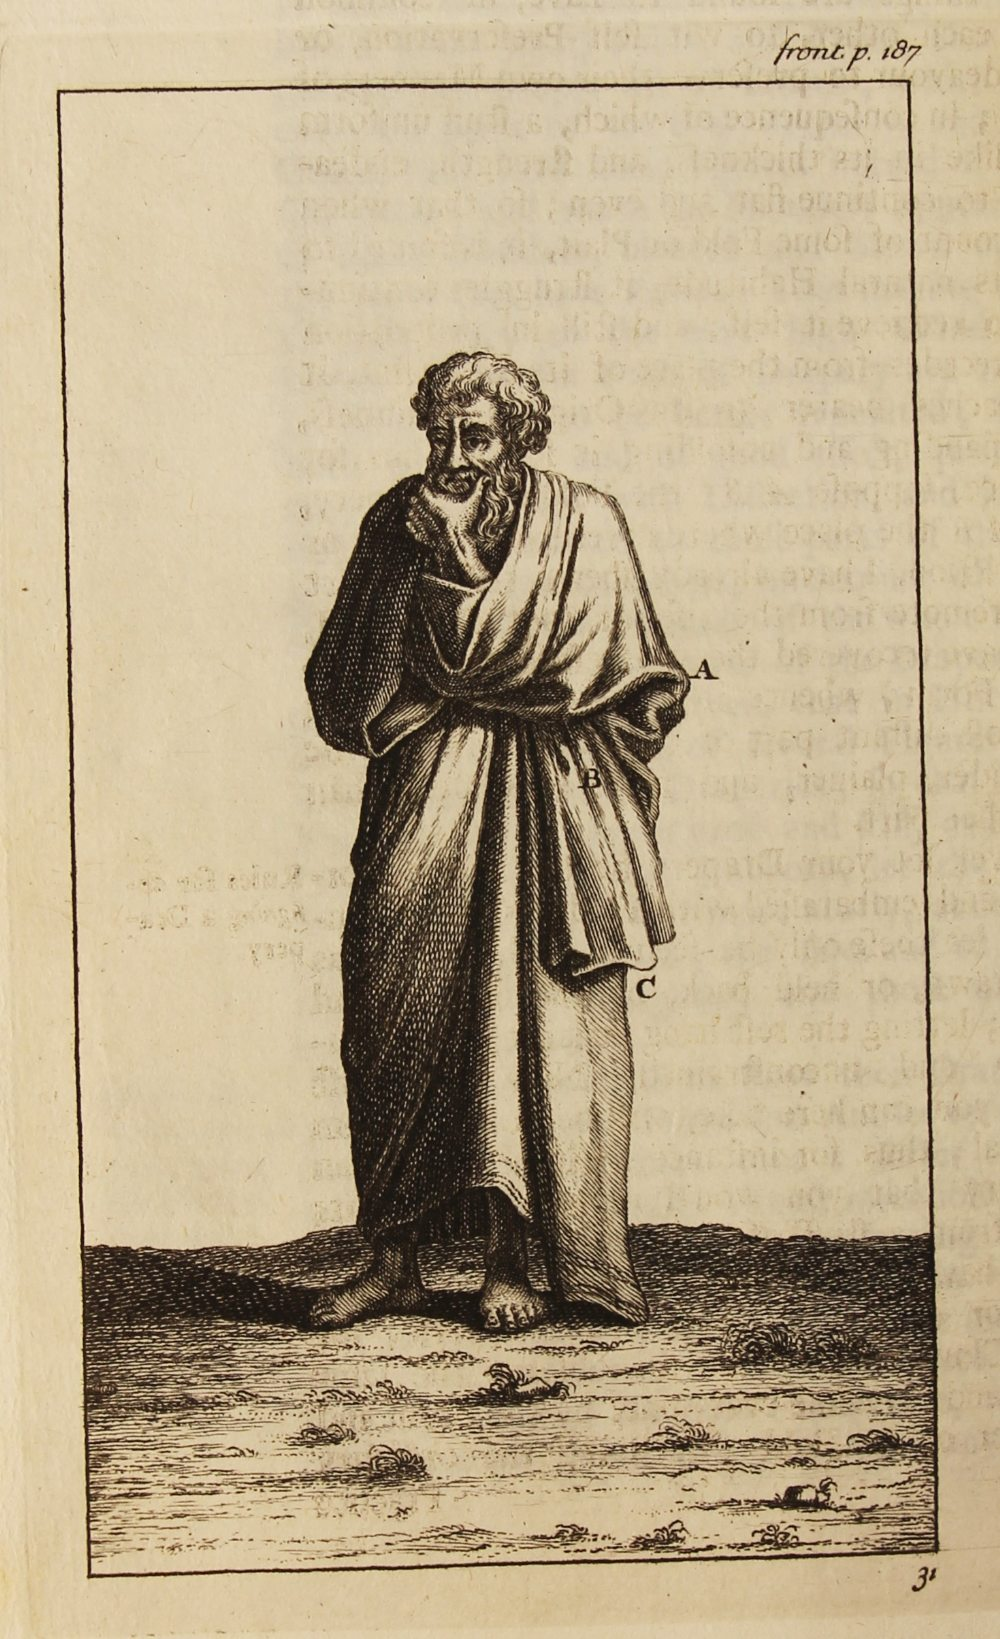 Da Vinci (L), A TREATISE OF PAINTING BY LEONARDO DA VINCI. TRANSLATED FROM THE ORIGINAL ITALIAN, AND - Image 6 of 9